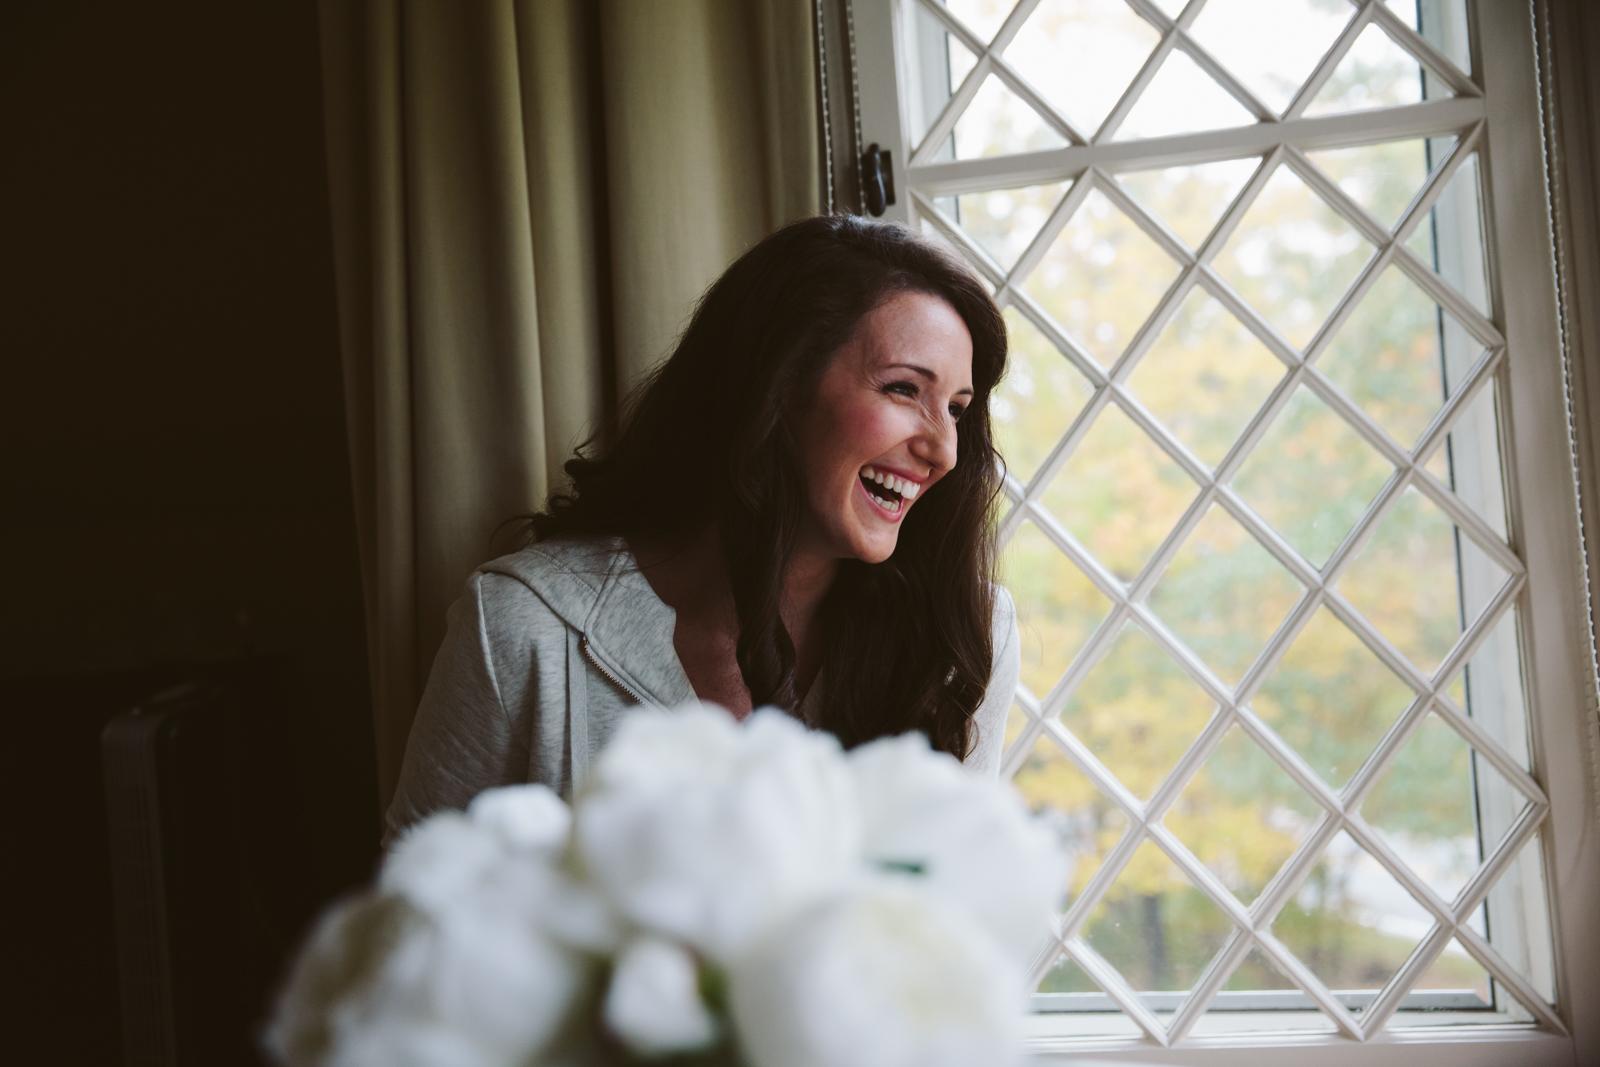 Glimmerstone-Mansion-Vermont-Wedding-Photography-Amanda-Morgan-16.jpg